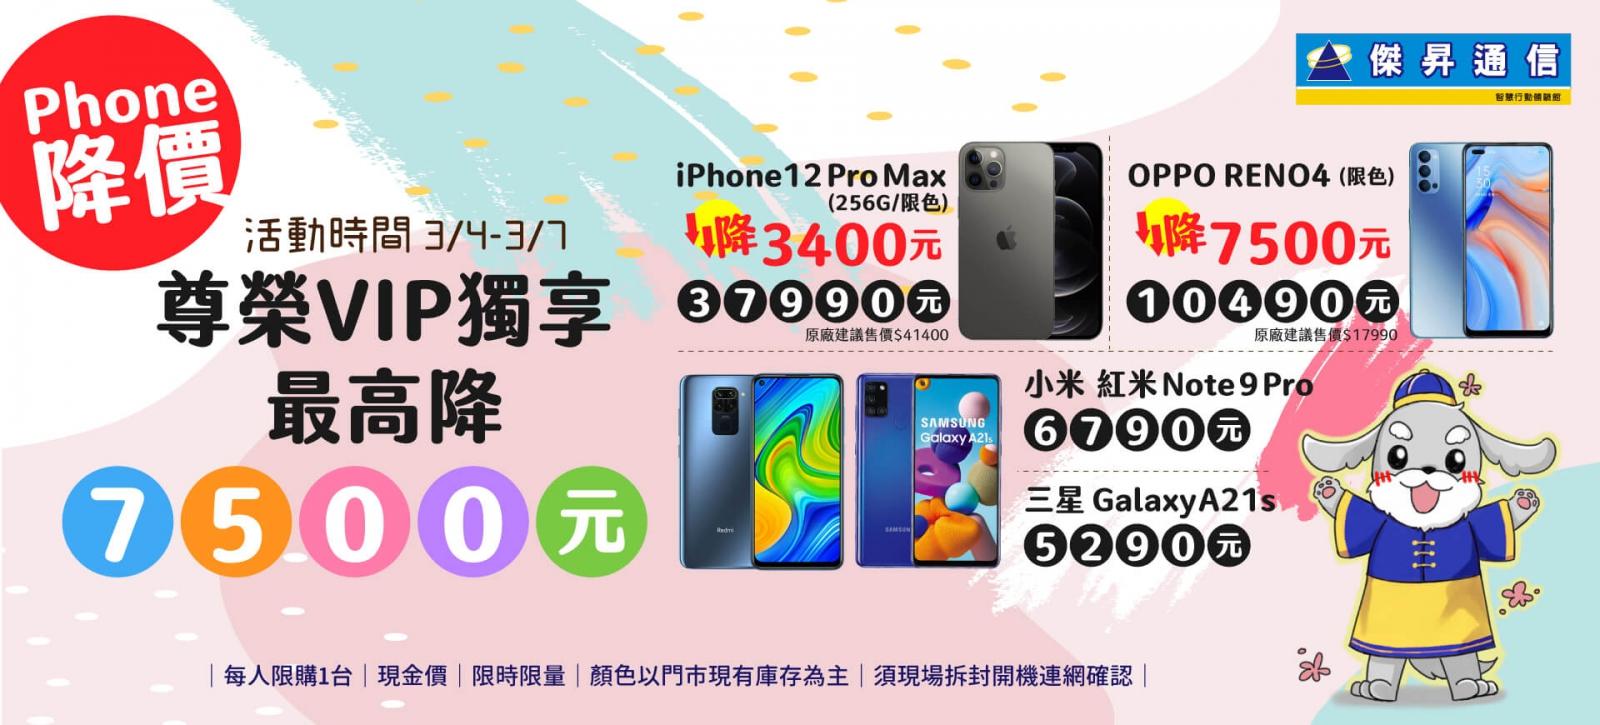 『Phone』降價!尊榮VIP獨享~最高降7500元!